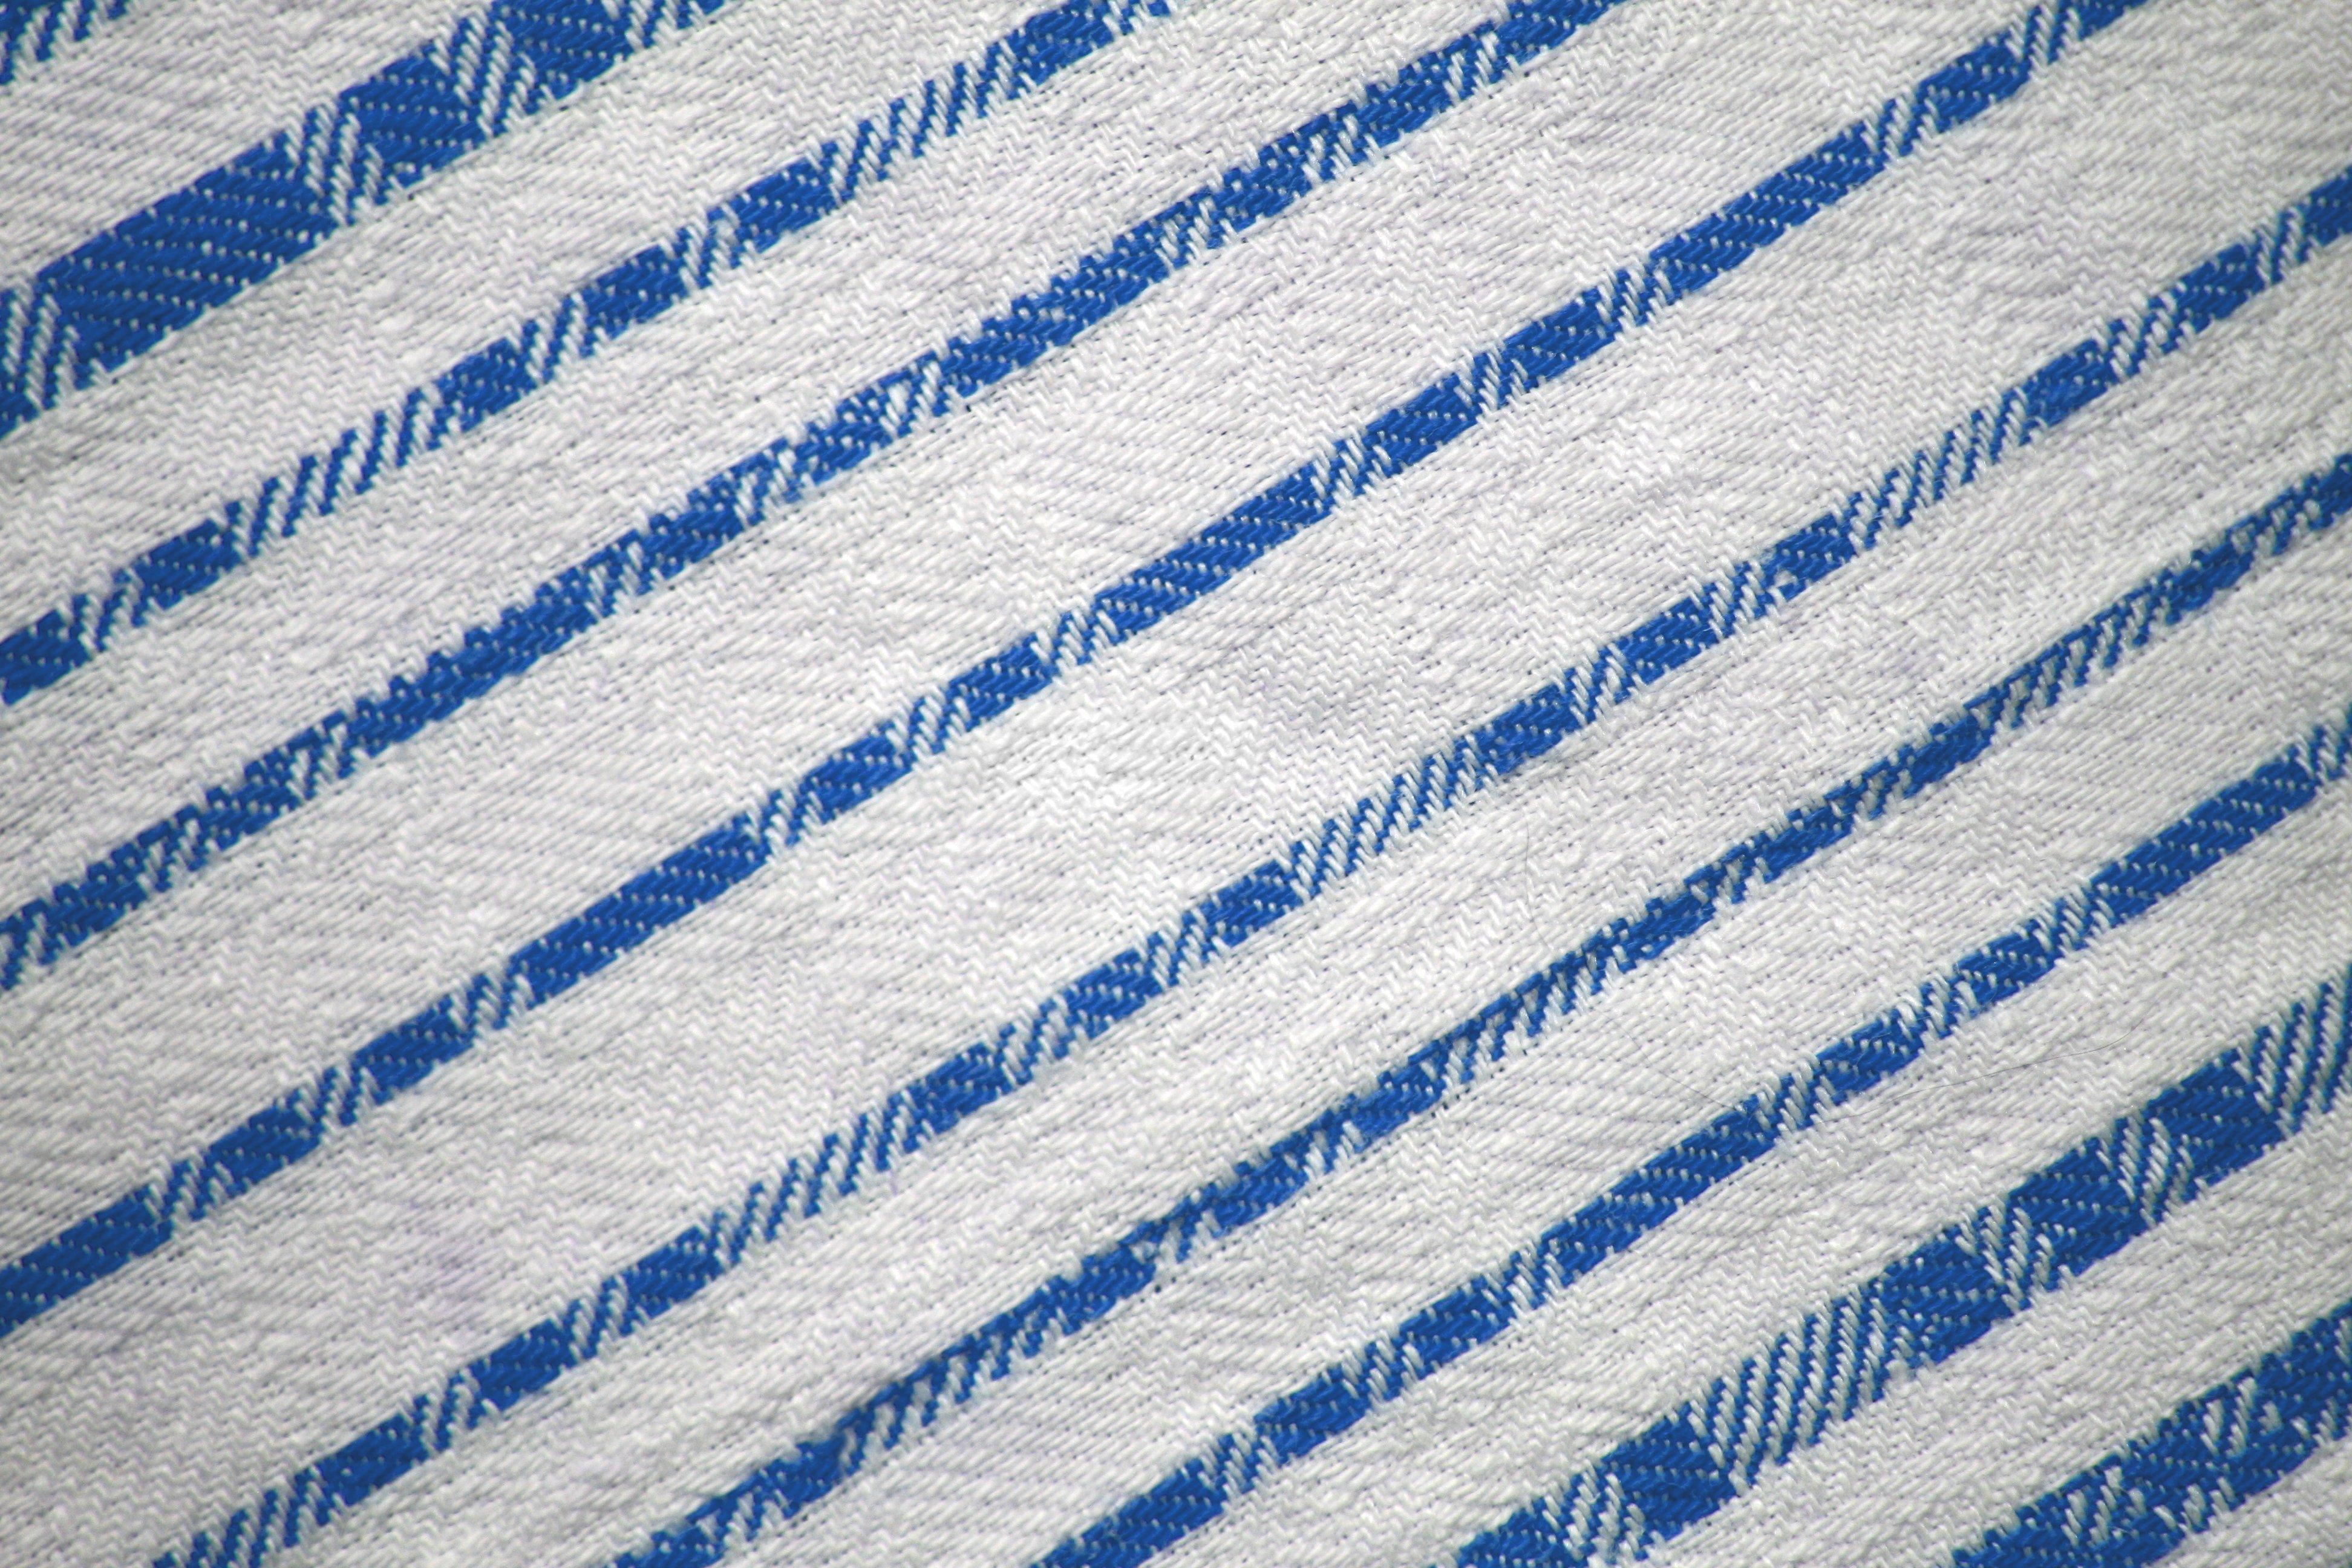 Light Blue On White Diagonal Stripes Fabric Texture